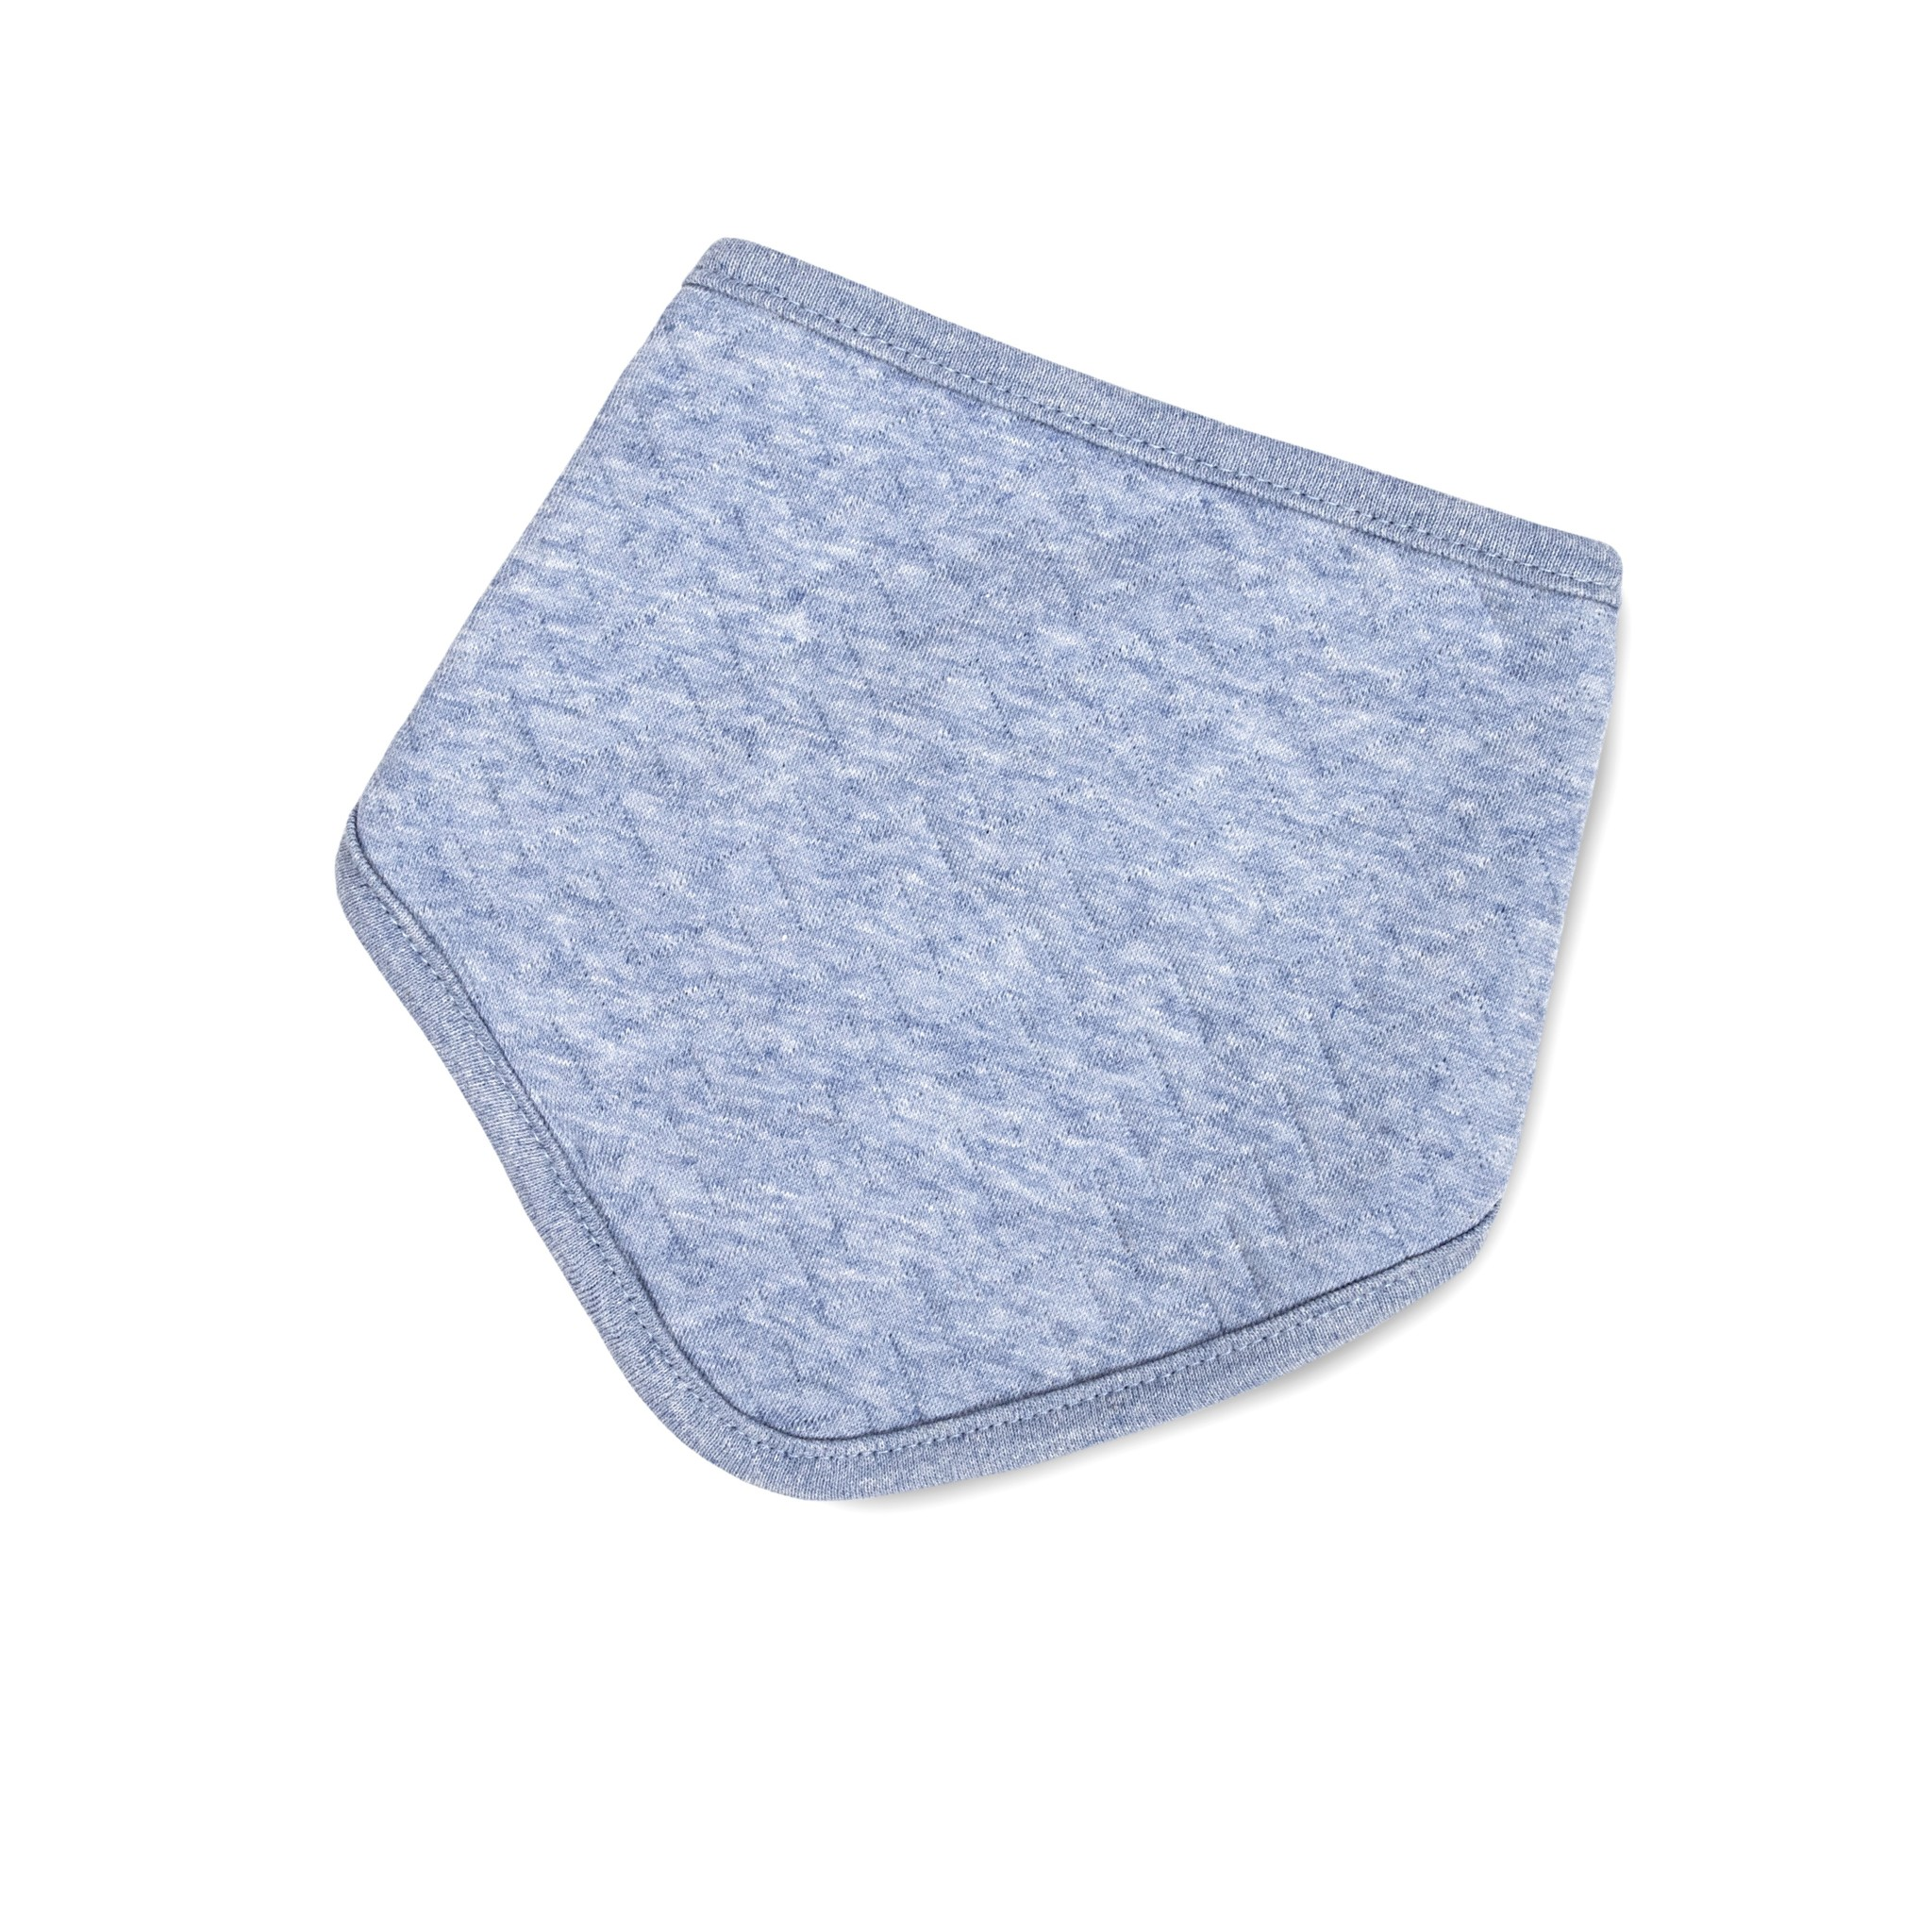 Bandana Chevron Denim Blue-4